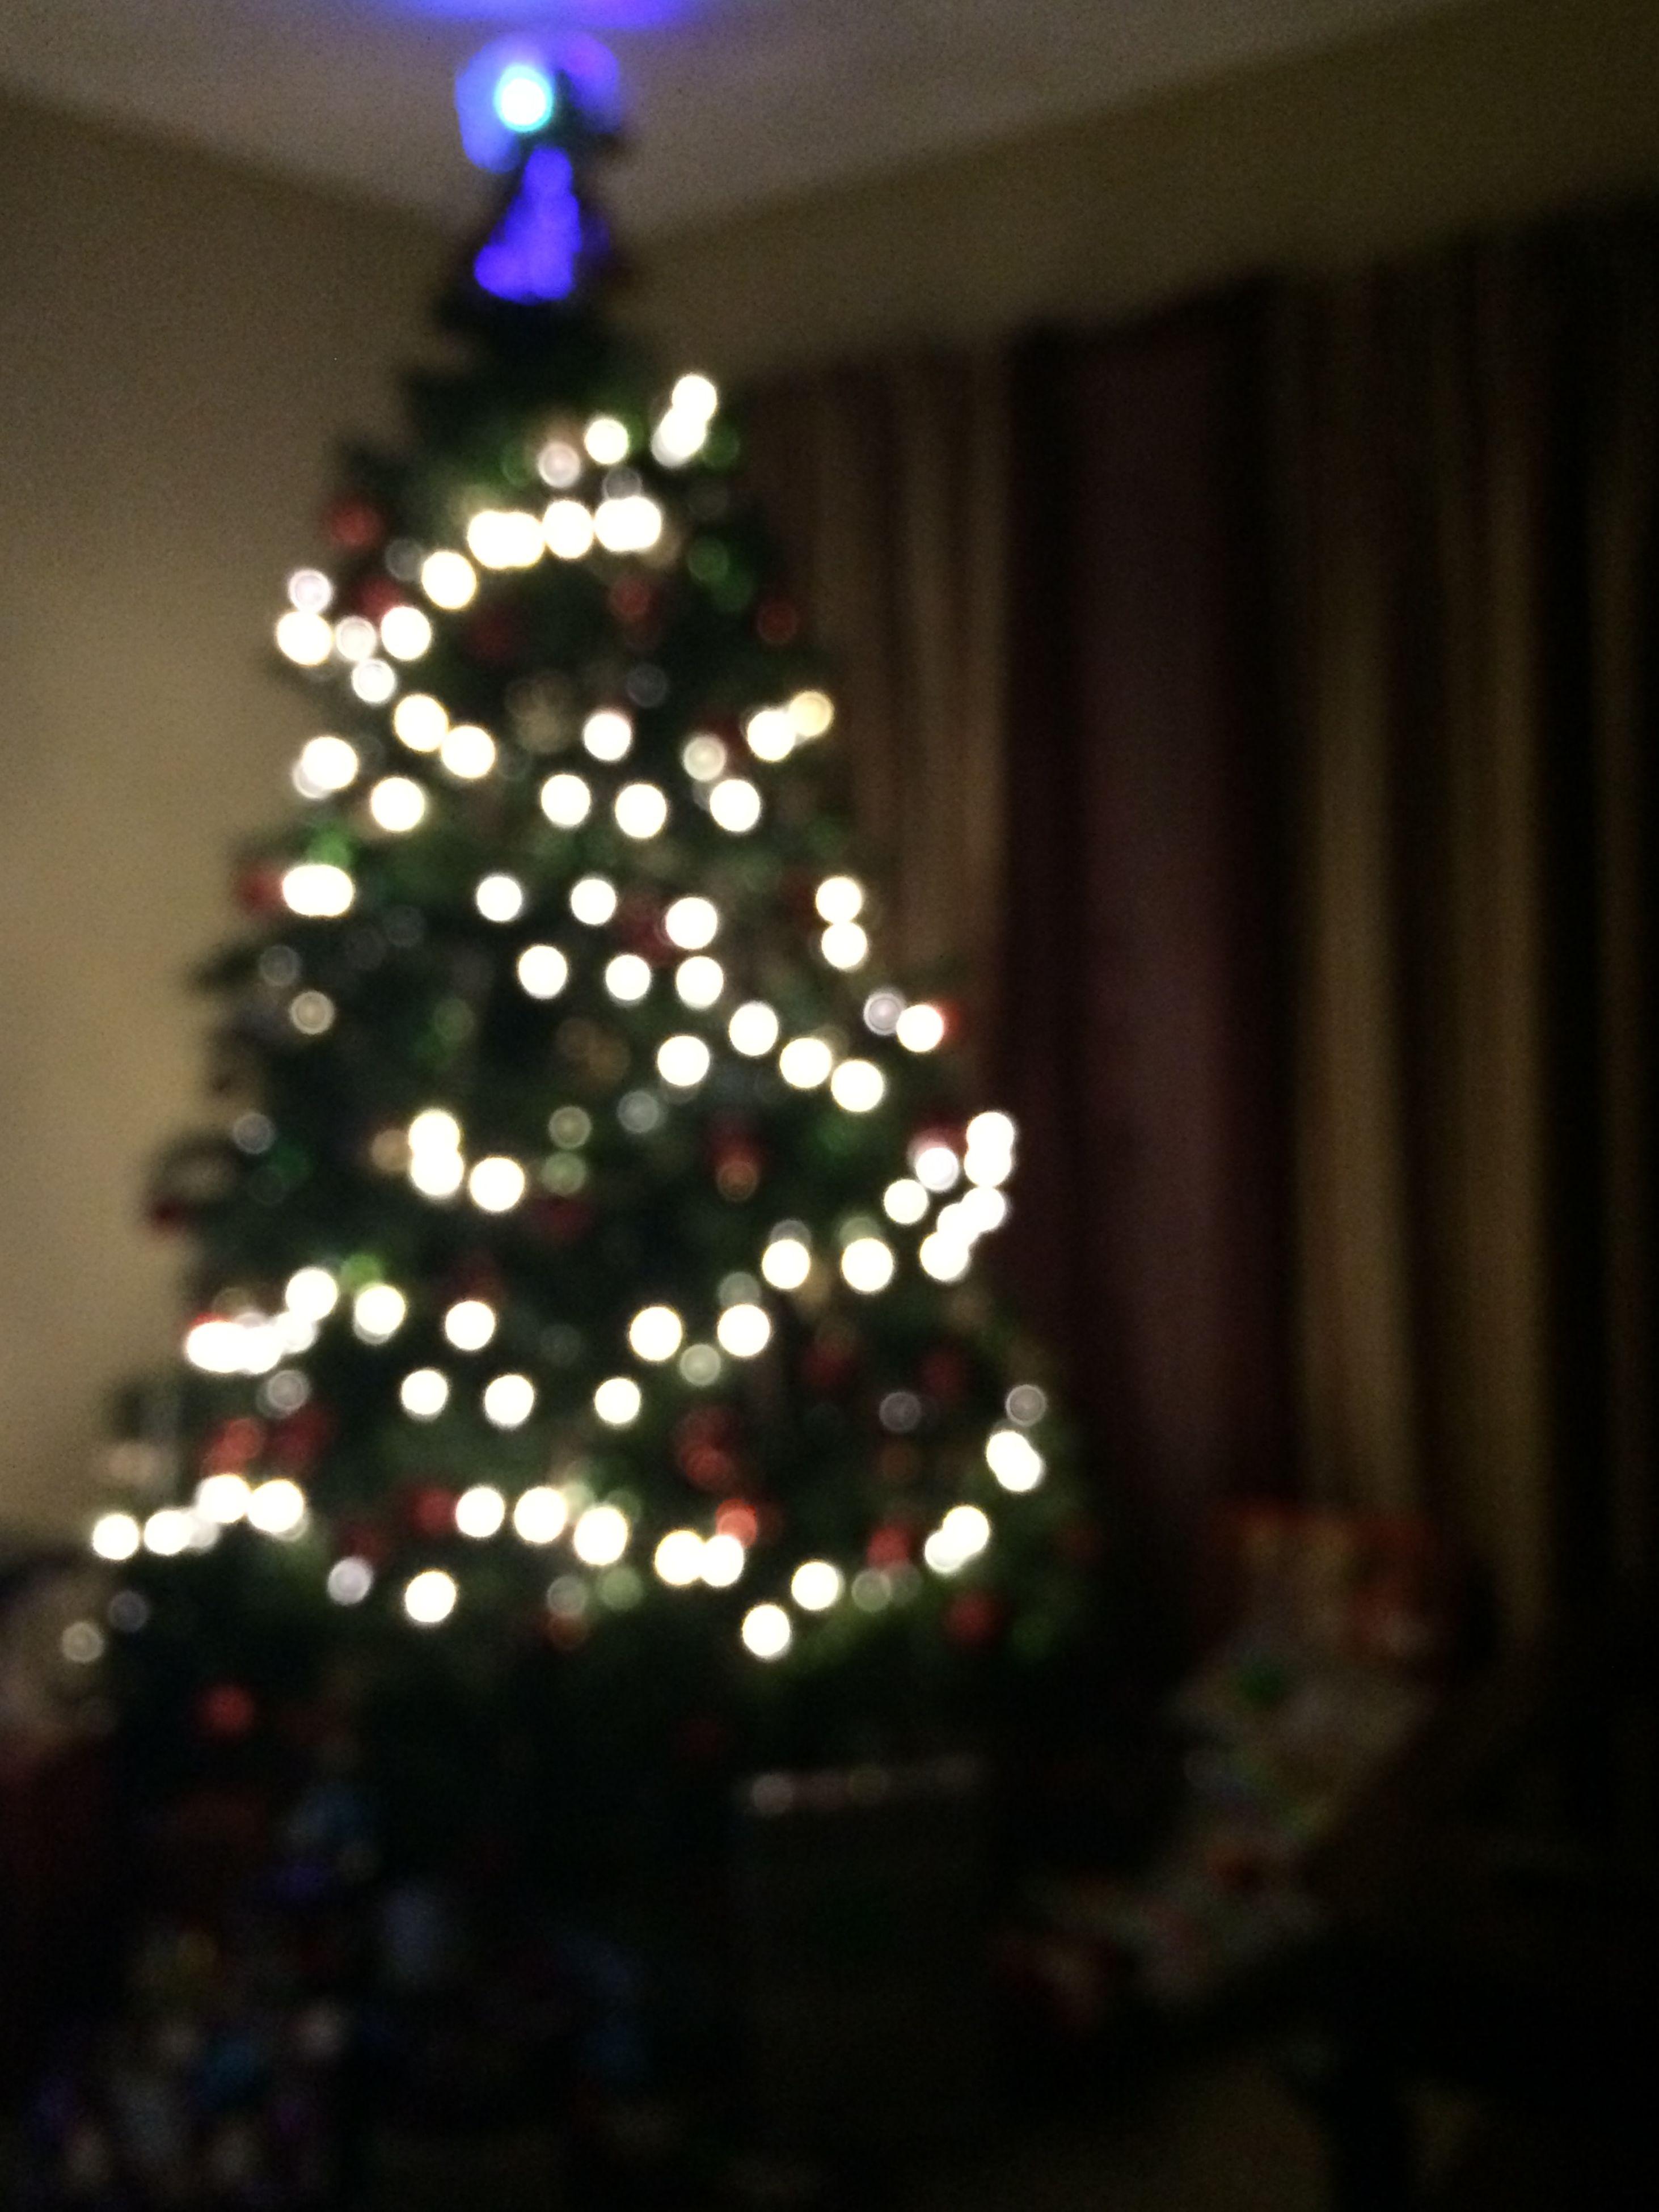 indoors, illuminated, decoration, lighting equipment, selective focus, home interior, decor, christmas, celebration, hanging, close-up, christmas decoration, focus on foreground, light - natural phenomenon, night, tradition, flower, christmas lights, no people, chandelier